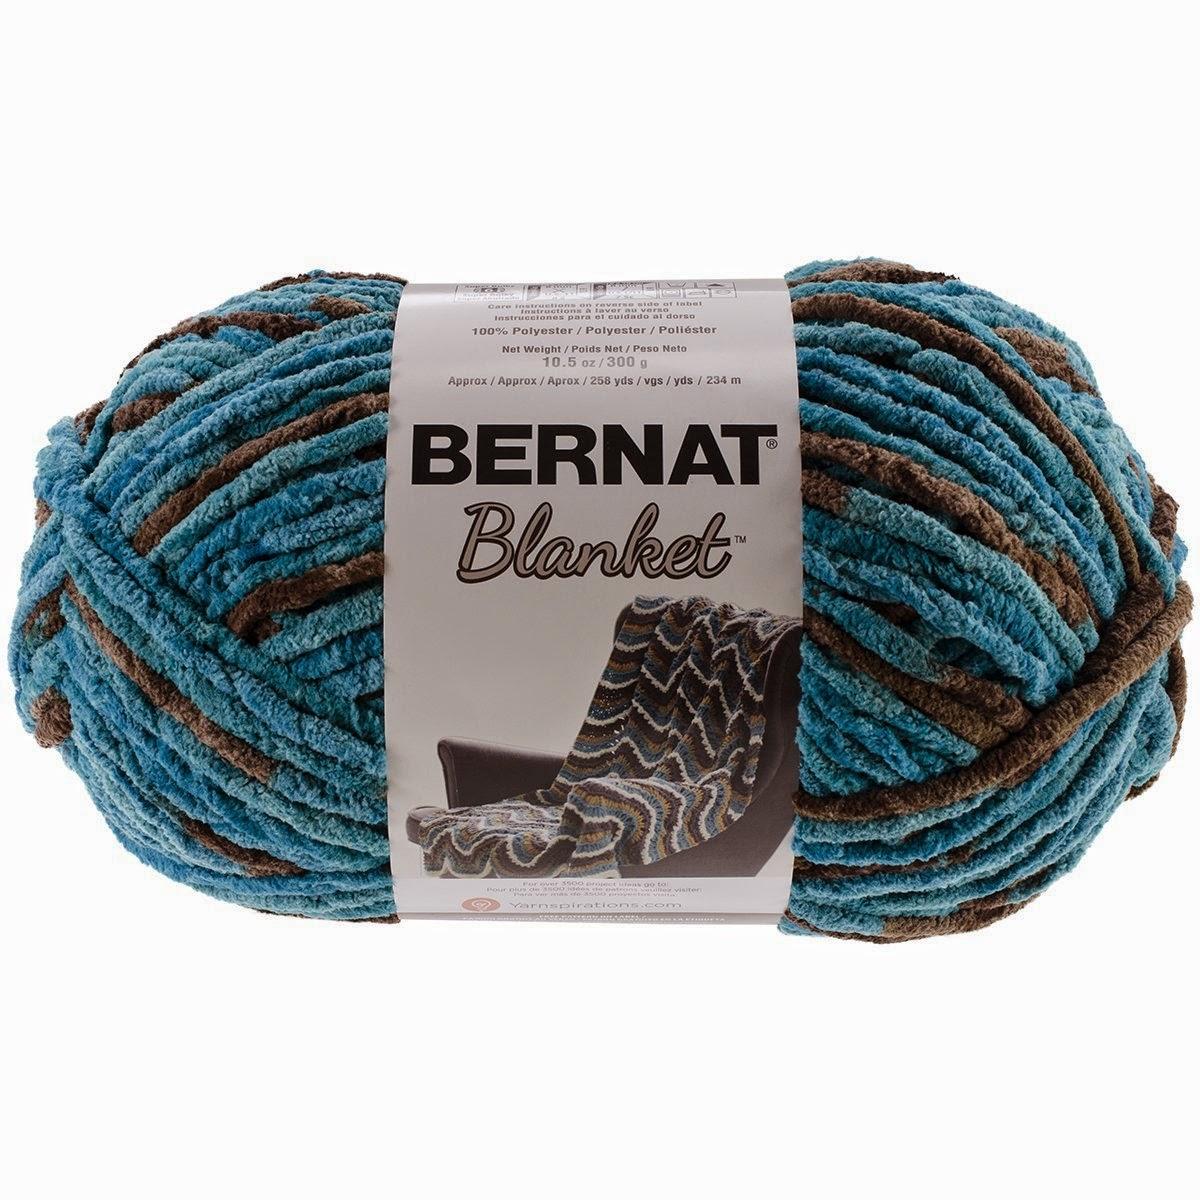 Crochet Patterns Made With Bernat Blanket Yarn : Bernat Blanket Review